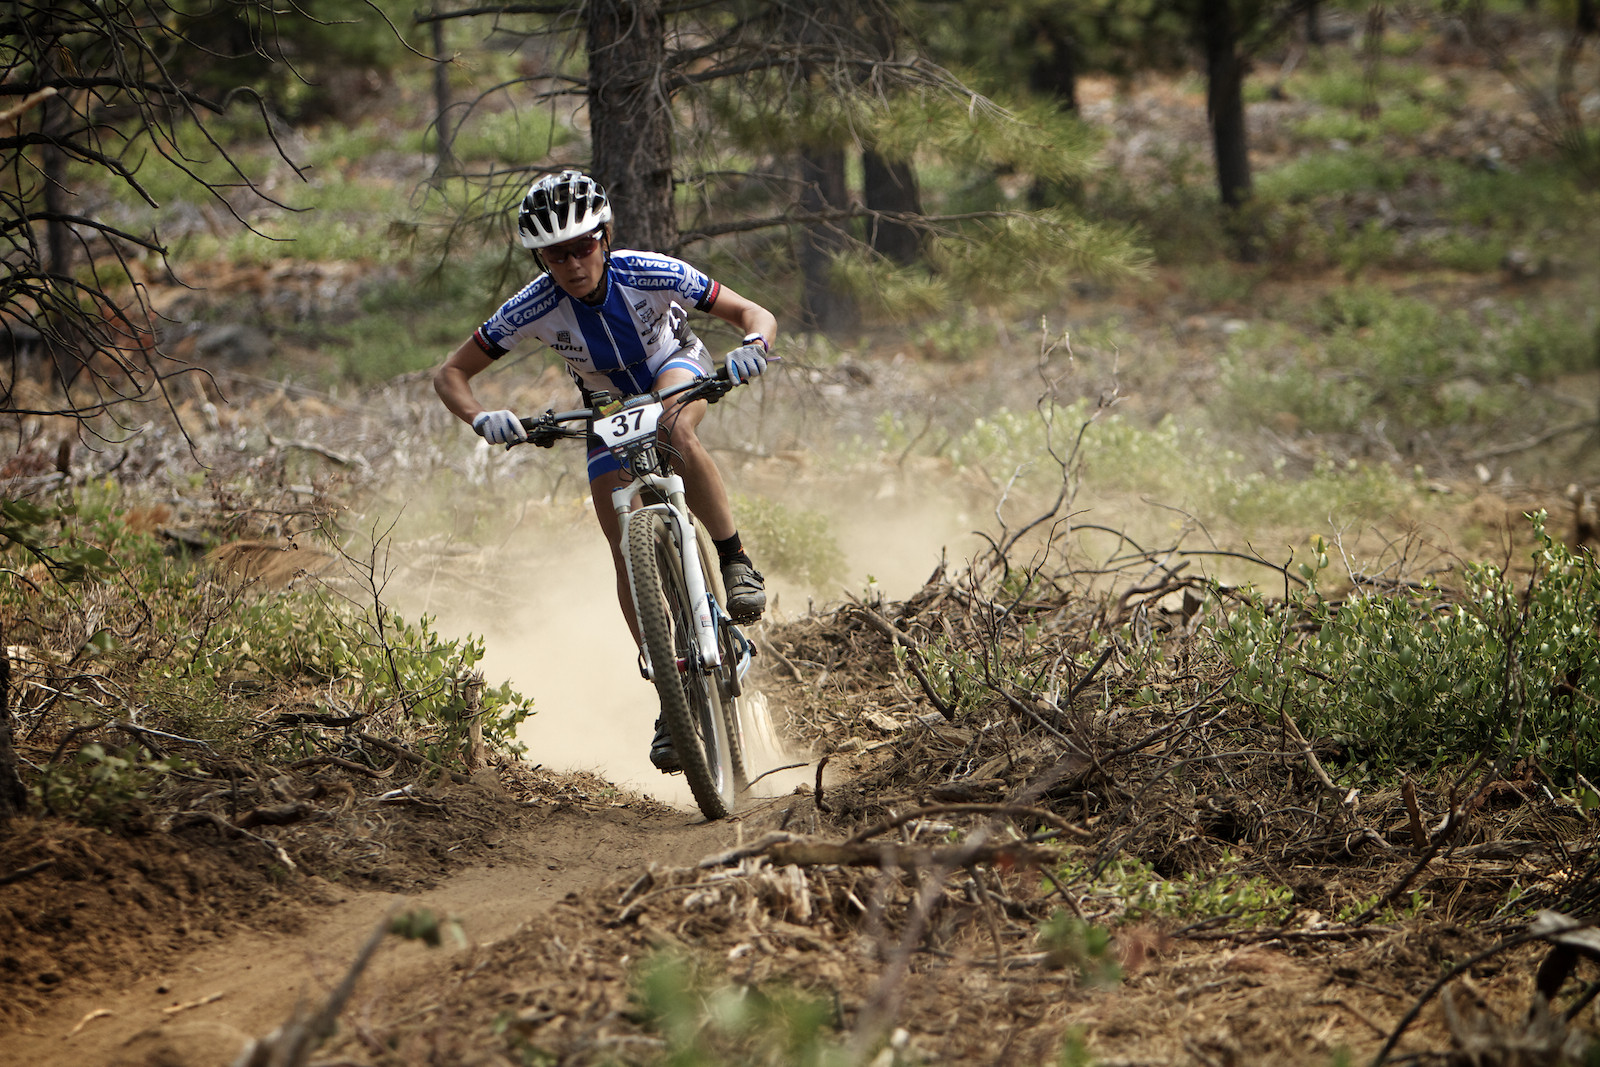 2012 Sisters Enduro Kelli Emmett - corytepper.com - Mountain Biking Pictures - Vital MTB